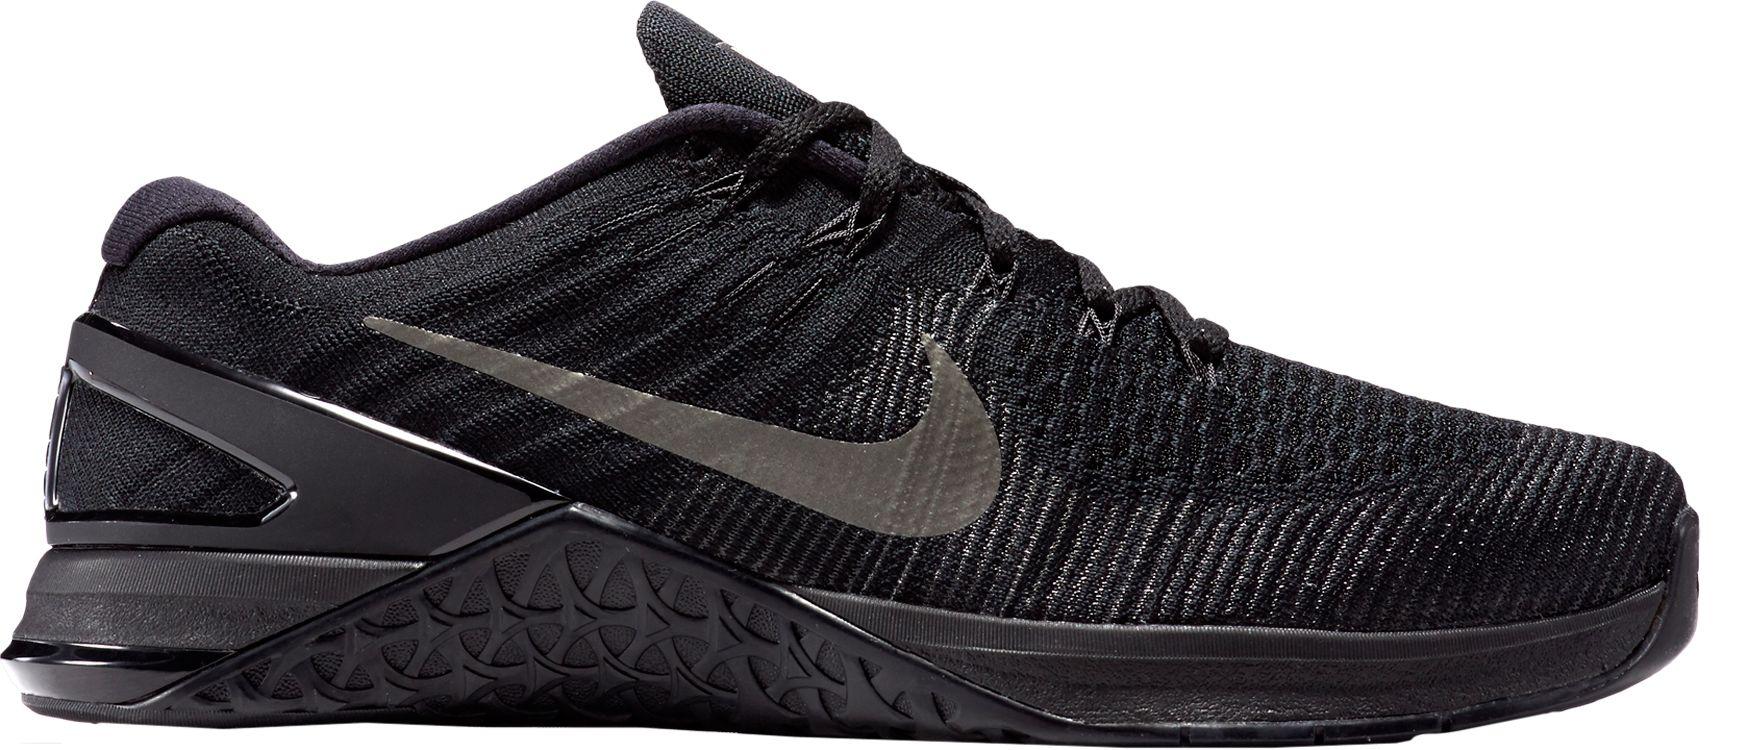 dfbcbc06b1d20 ... Nike Mens Metcon DSX Flyknit Training Shoes DICKS Sporting .